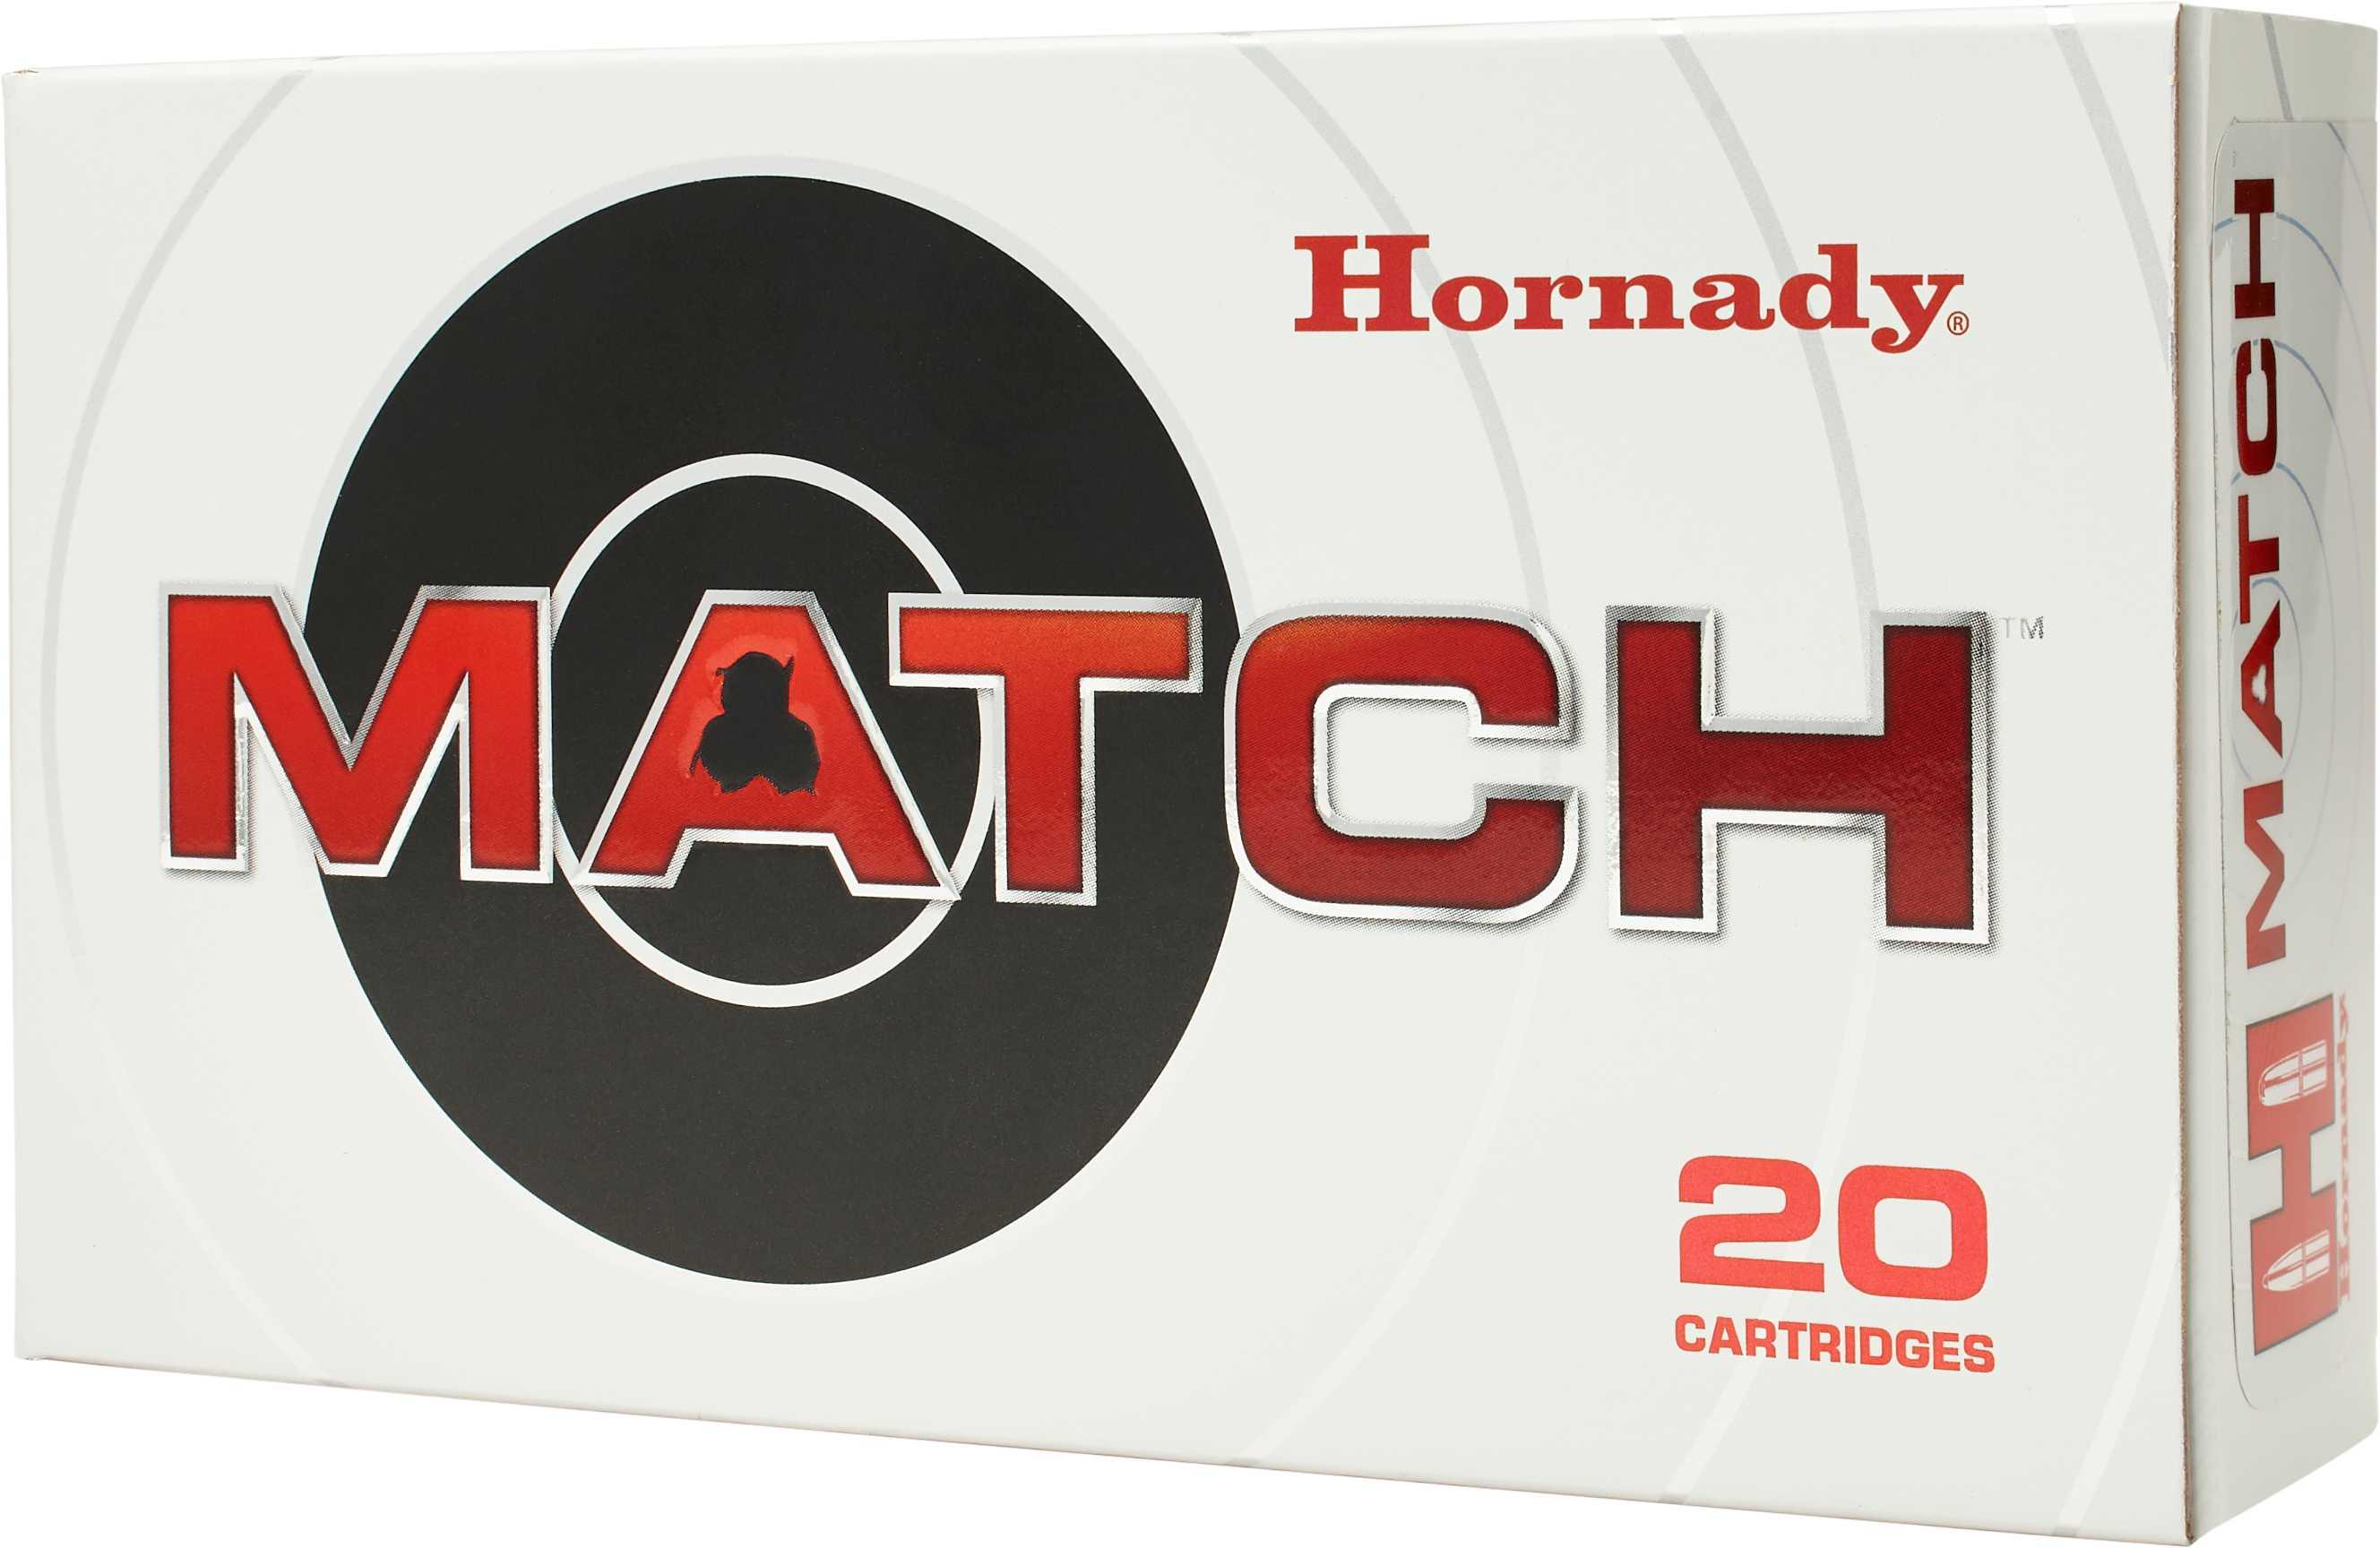 Hornady Match 338 Lapua 250 Grain Boat Tail Hollow Point 20 Round Box 8230